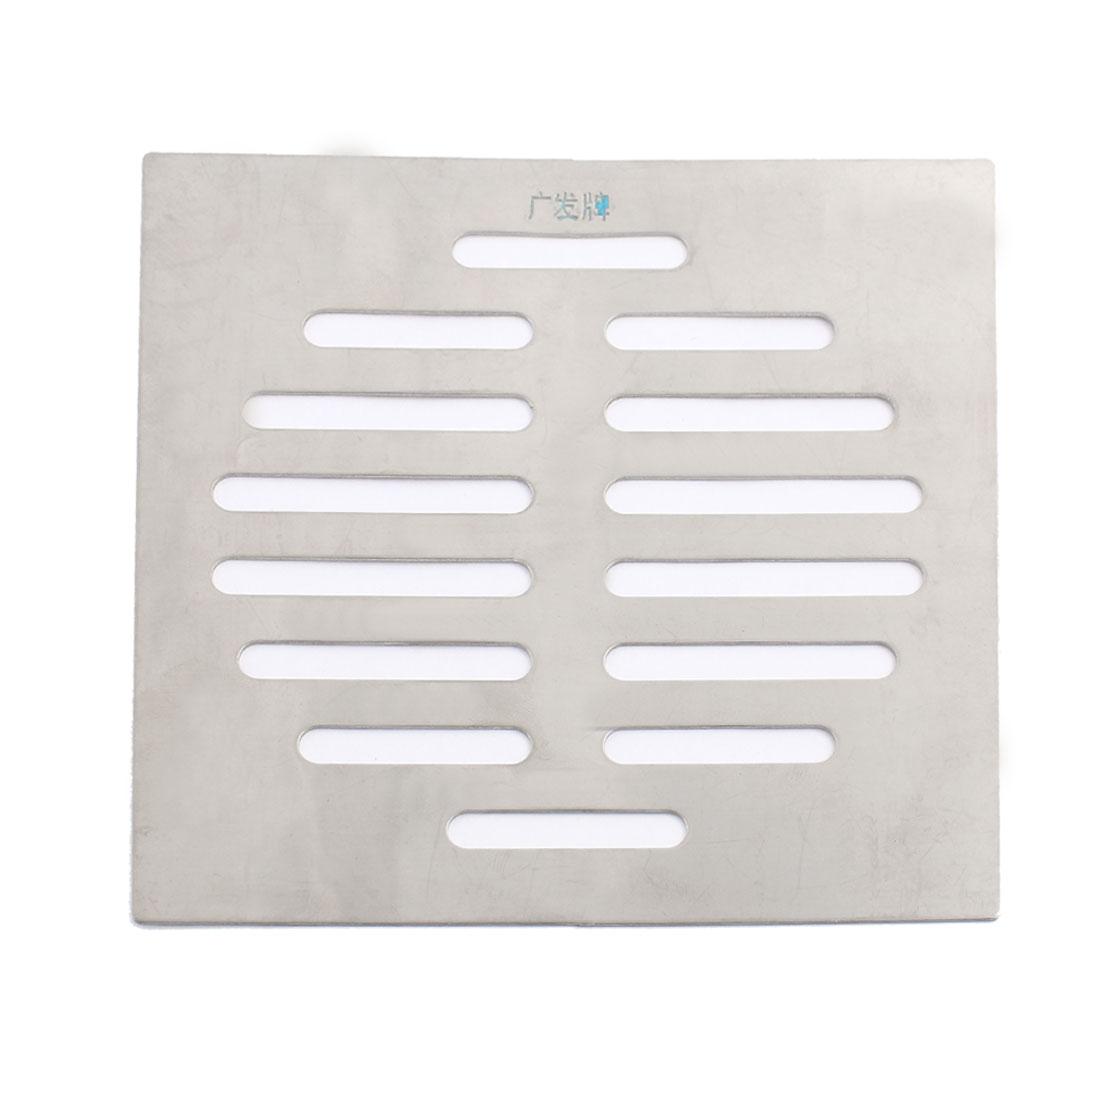 5 Inch Stainless Steel Floor Drain Strainer Cover Bath Basin Filter